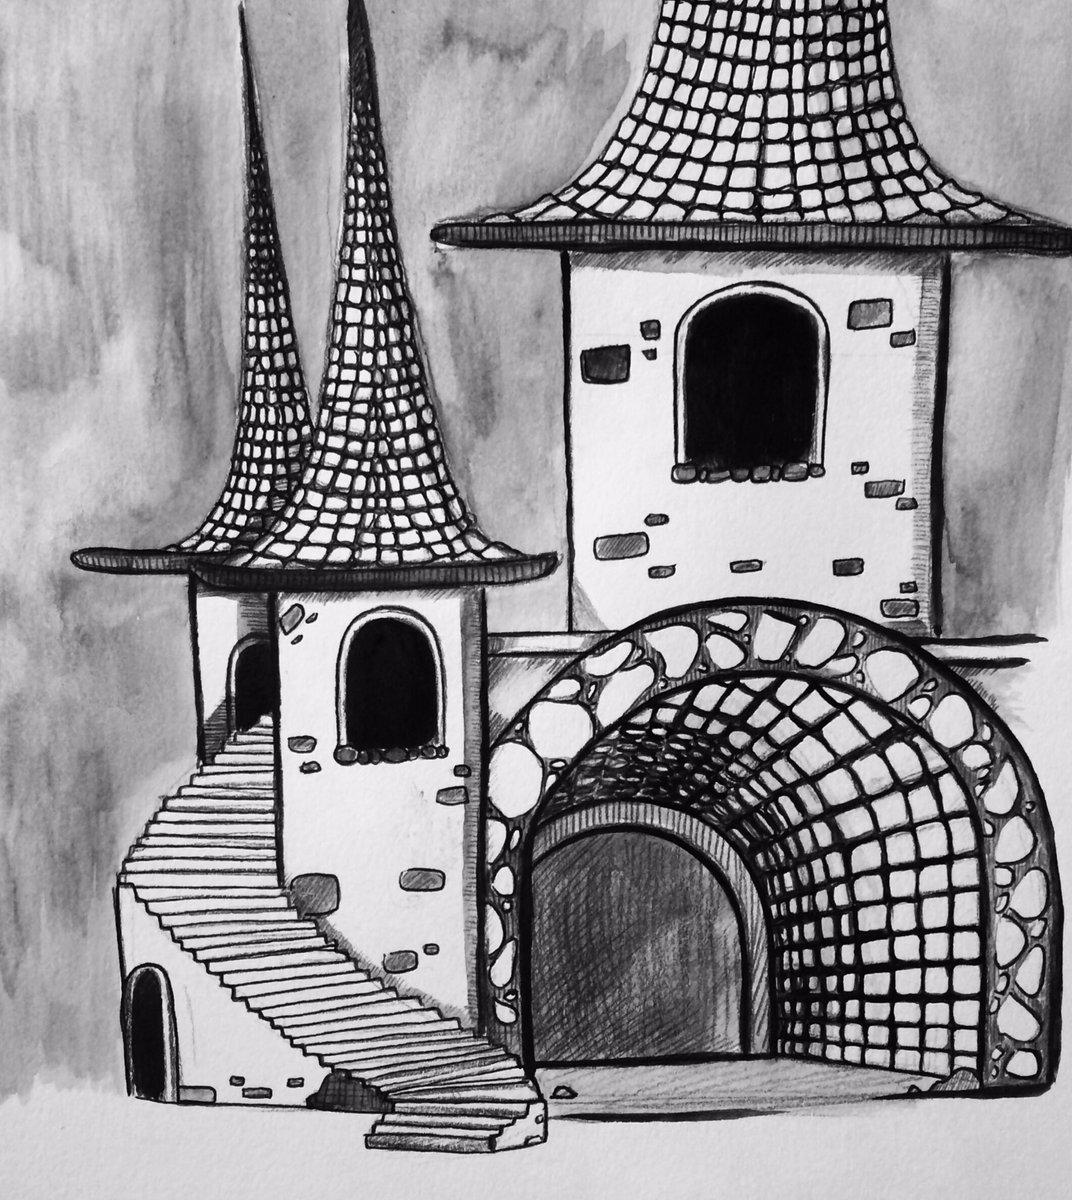 #myart #MyArtwork #watercolors #watercolorpainting #ink #sketch #drawing https://t.co/BzFZP3PFDO